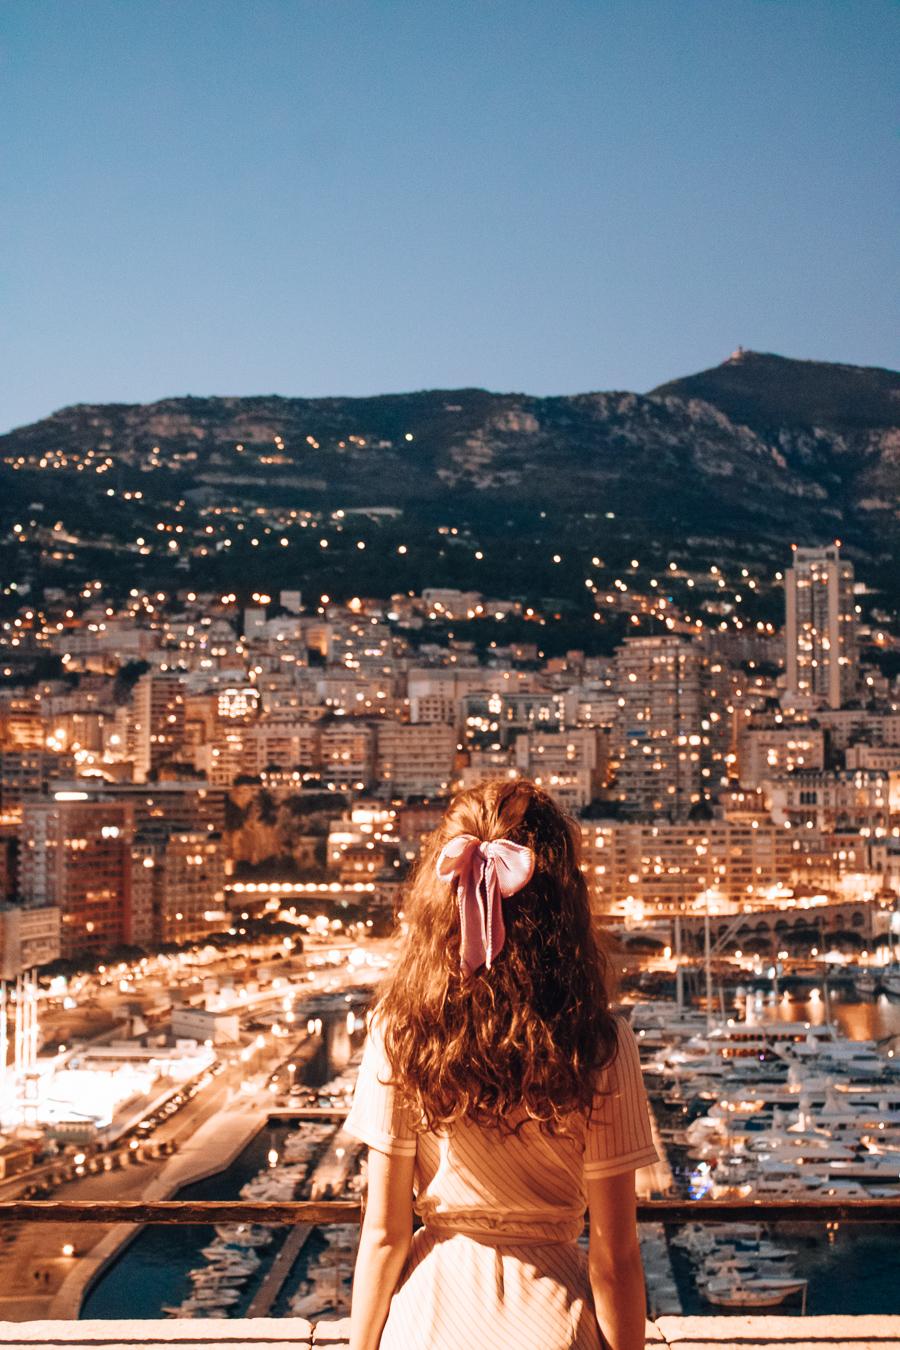 Night in Monaco